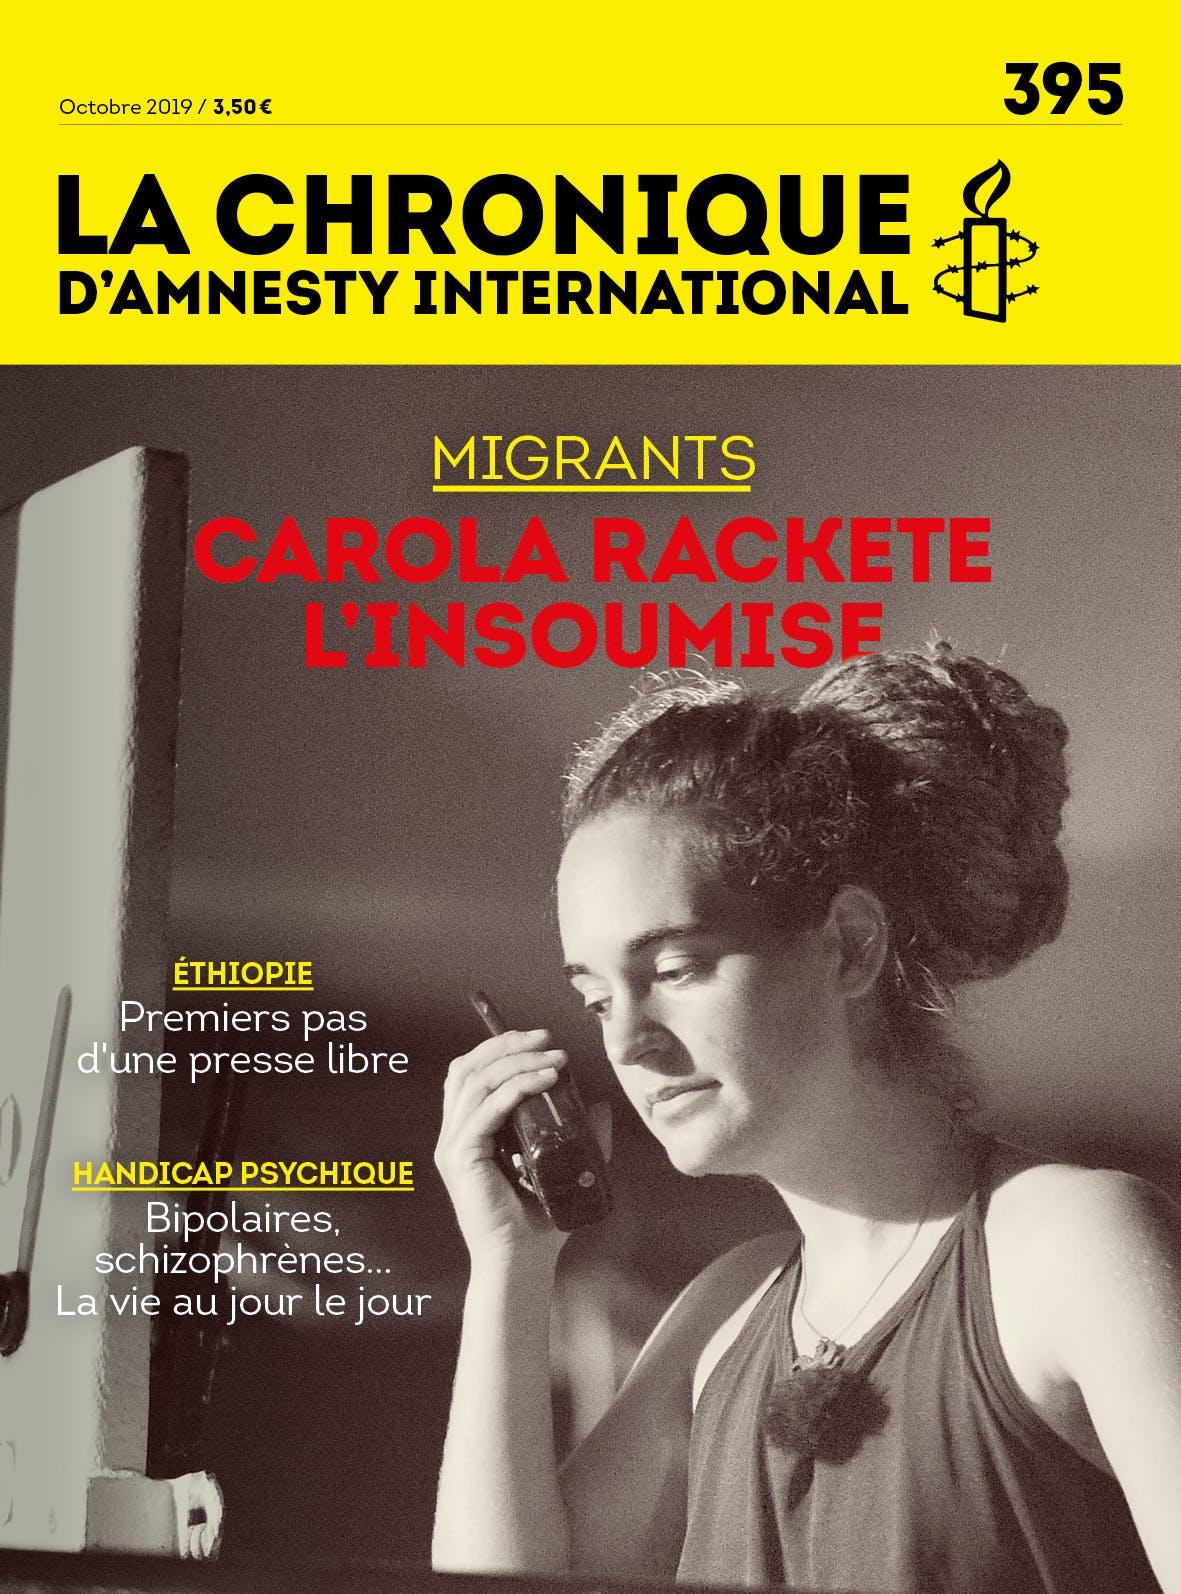 Couv Chronique octobre 2019